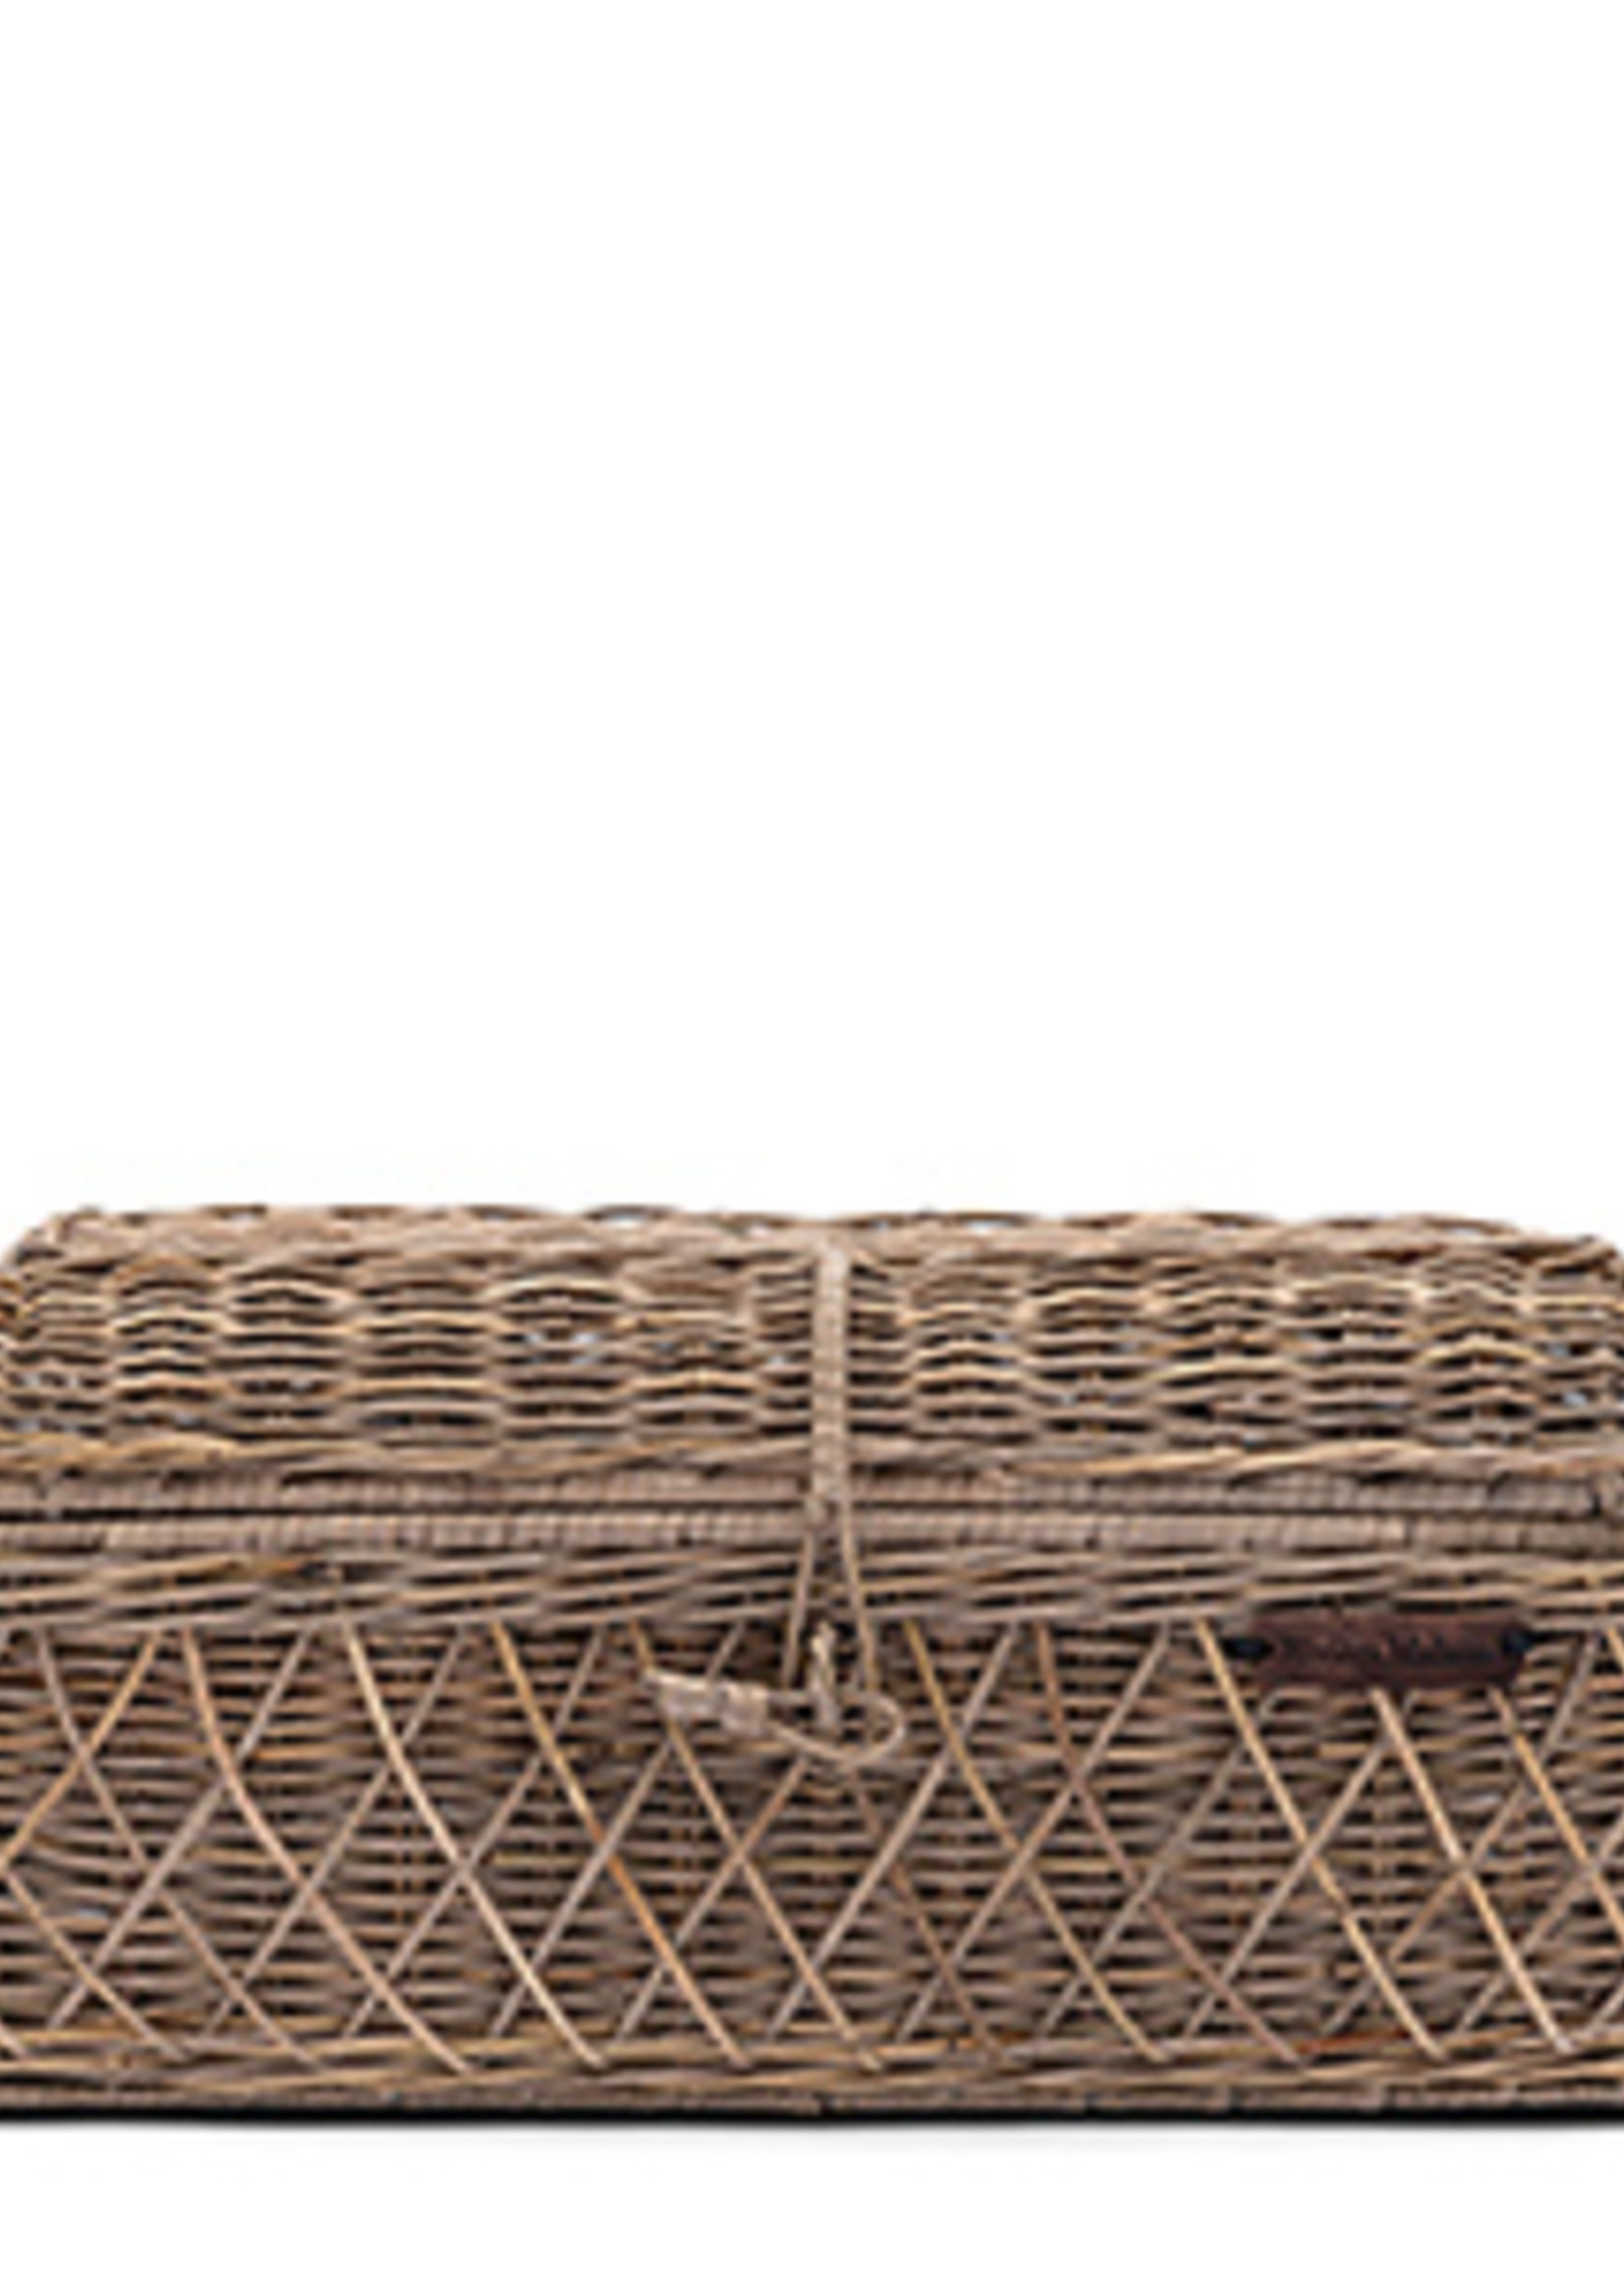 Riviera Maison RR Diamond Weave Bread Basket